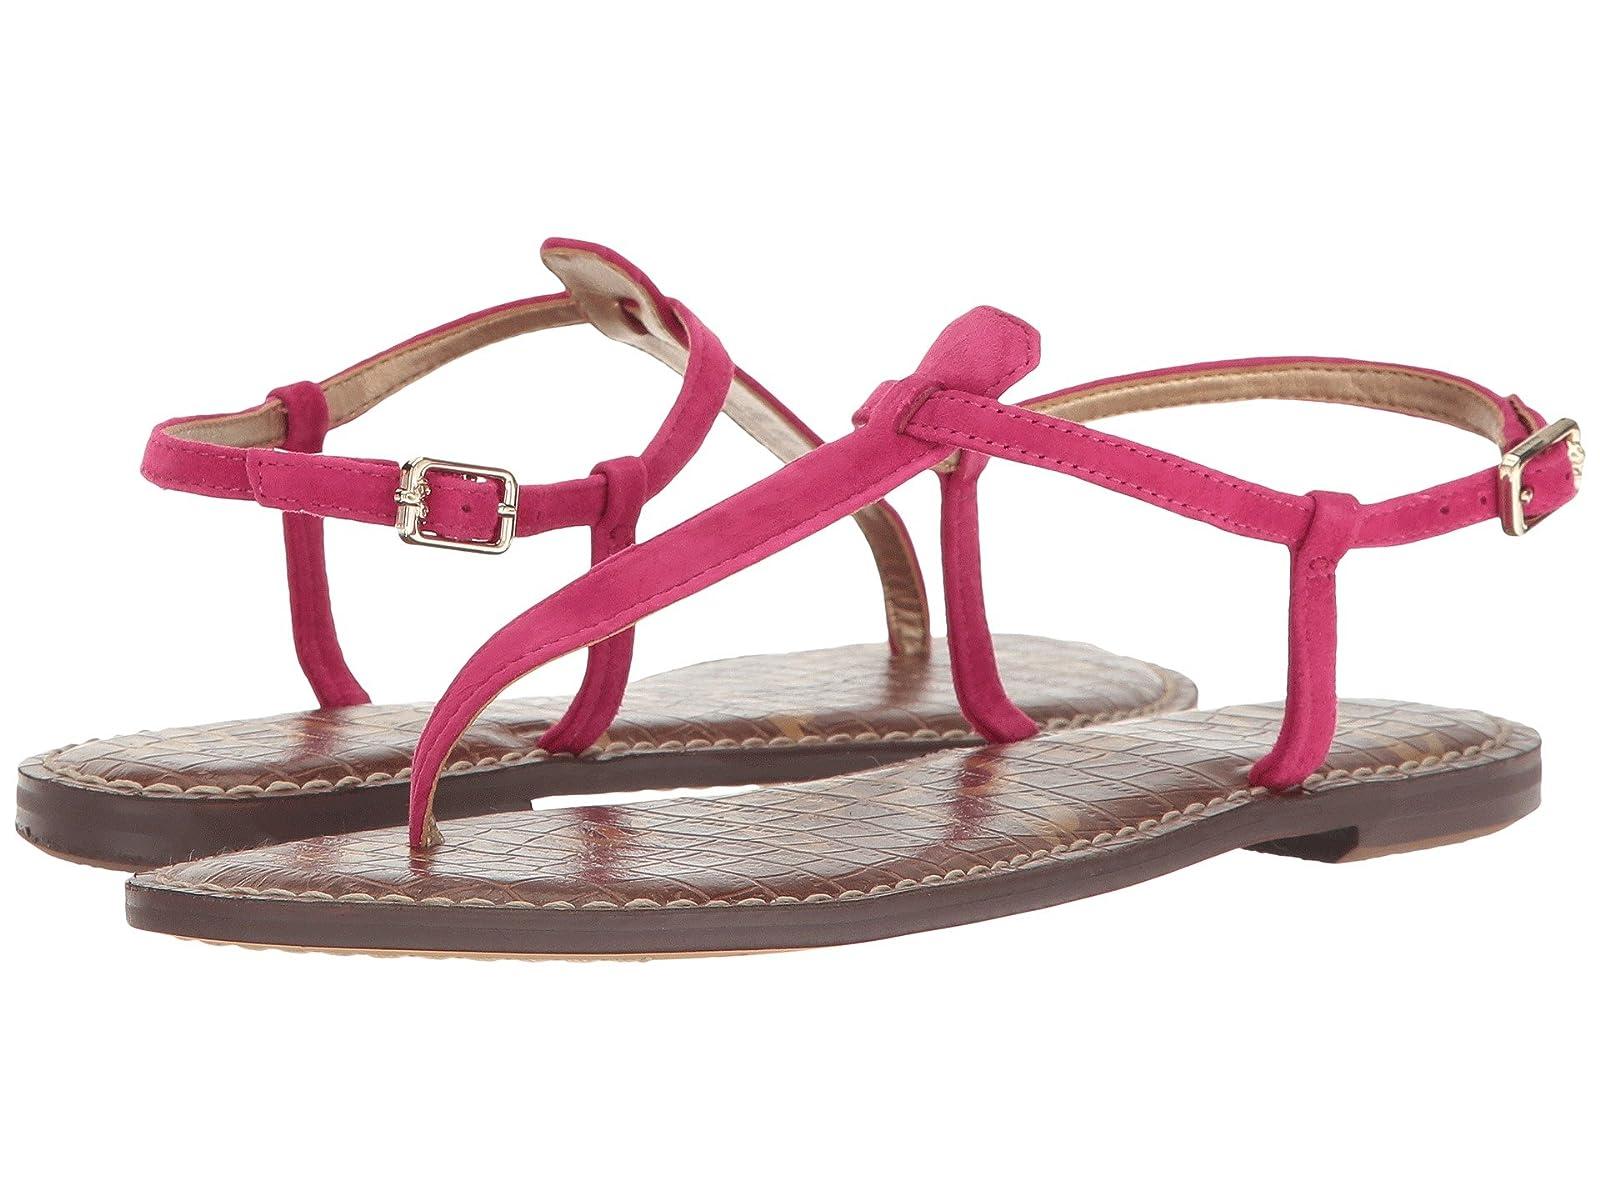 Sam Edelman GigiCheap and distinctive eye-catching shoes